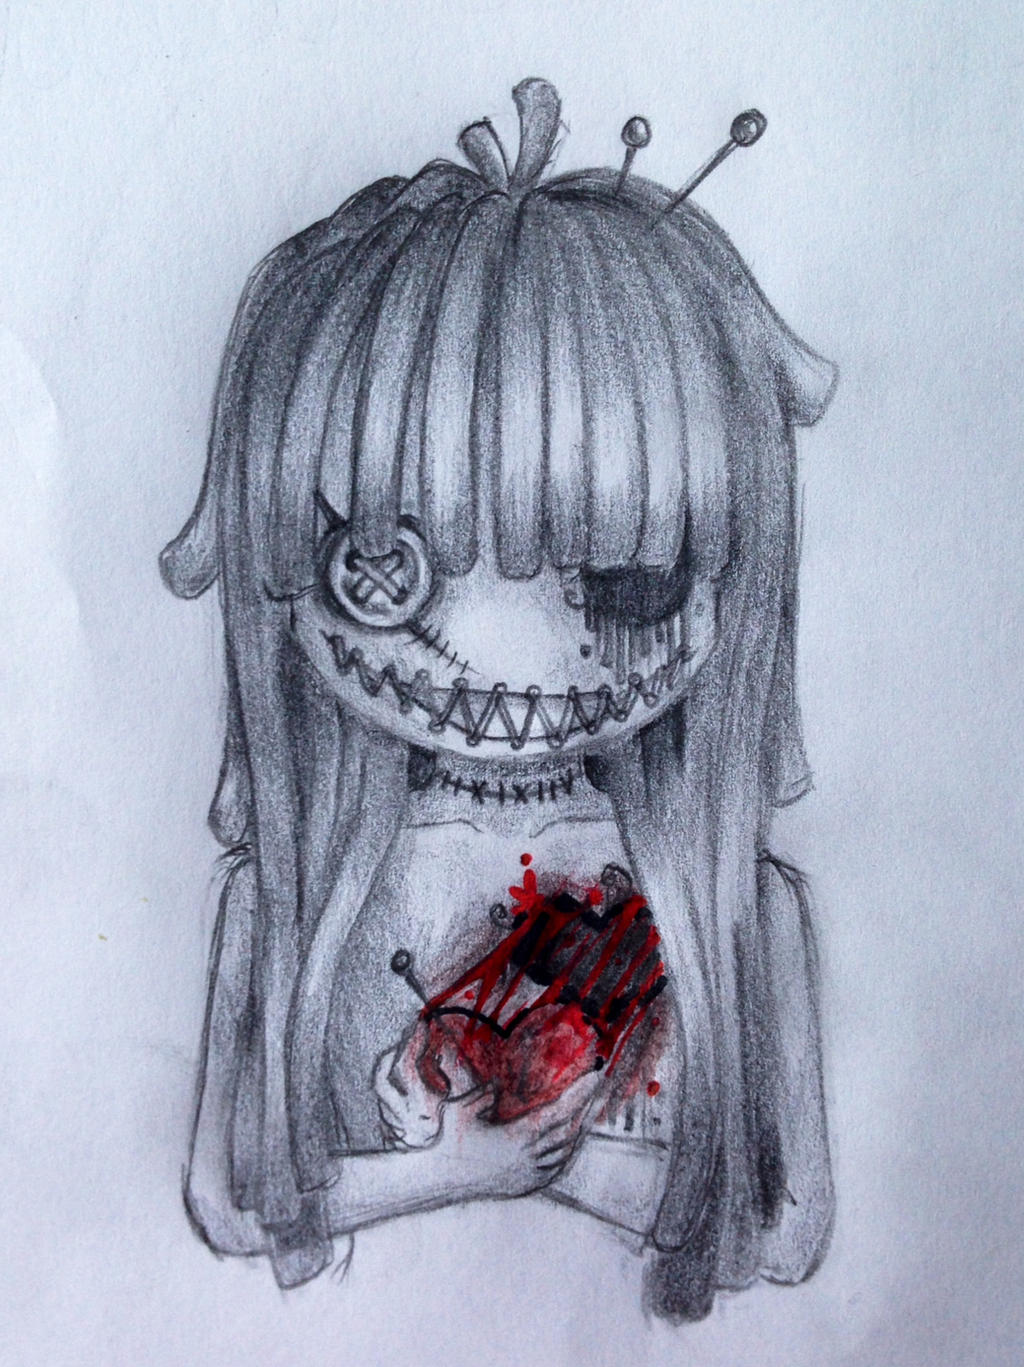 Dolls Don't Have Hearts by Vampiretard